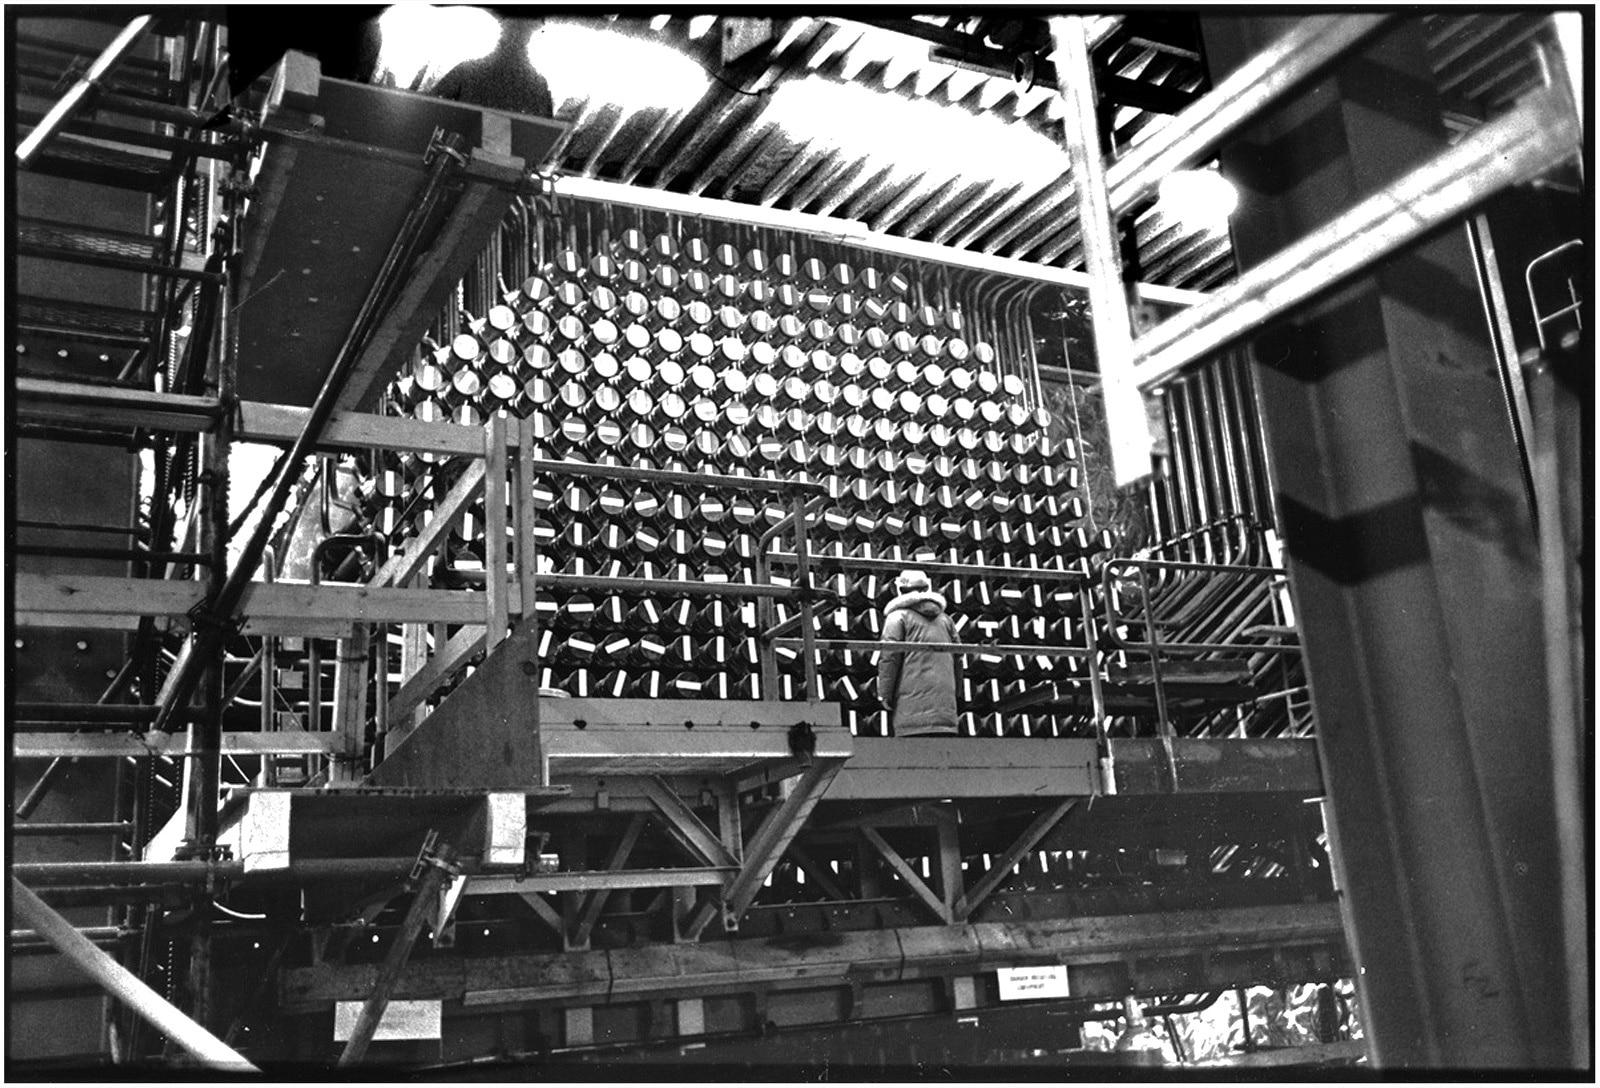 10 Face of CANDU reactor